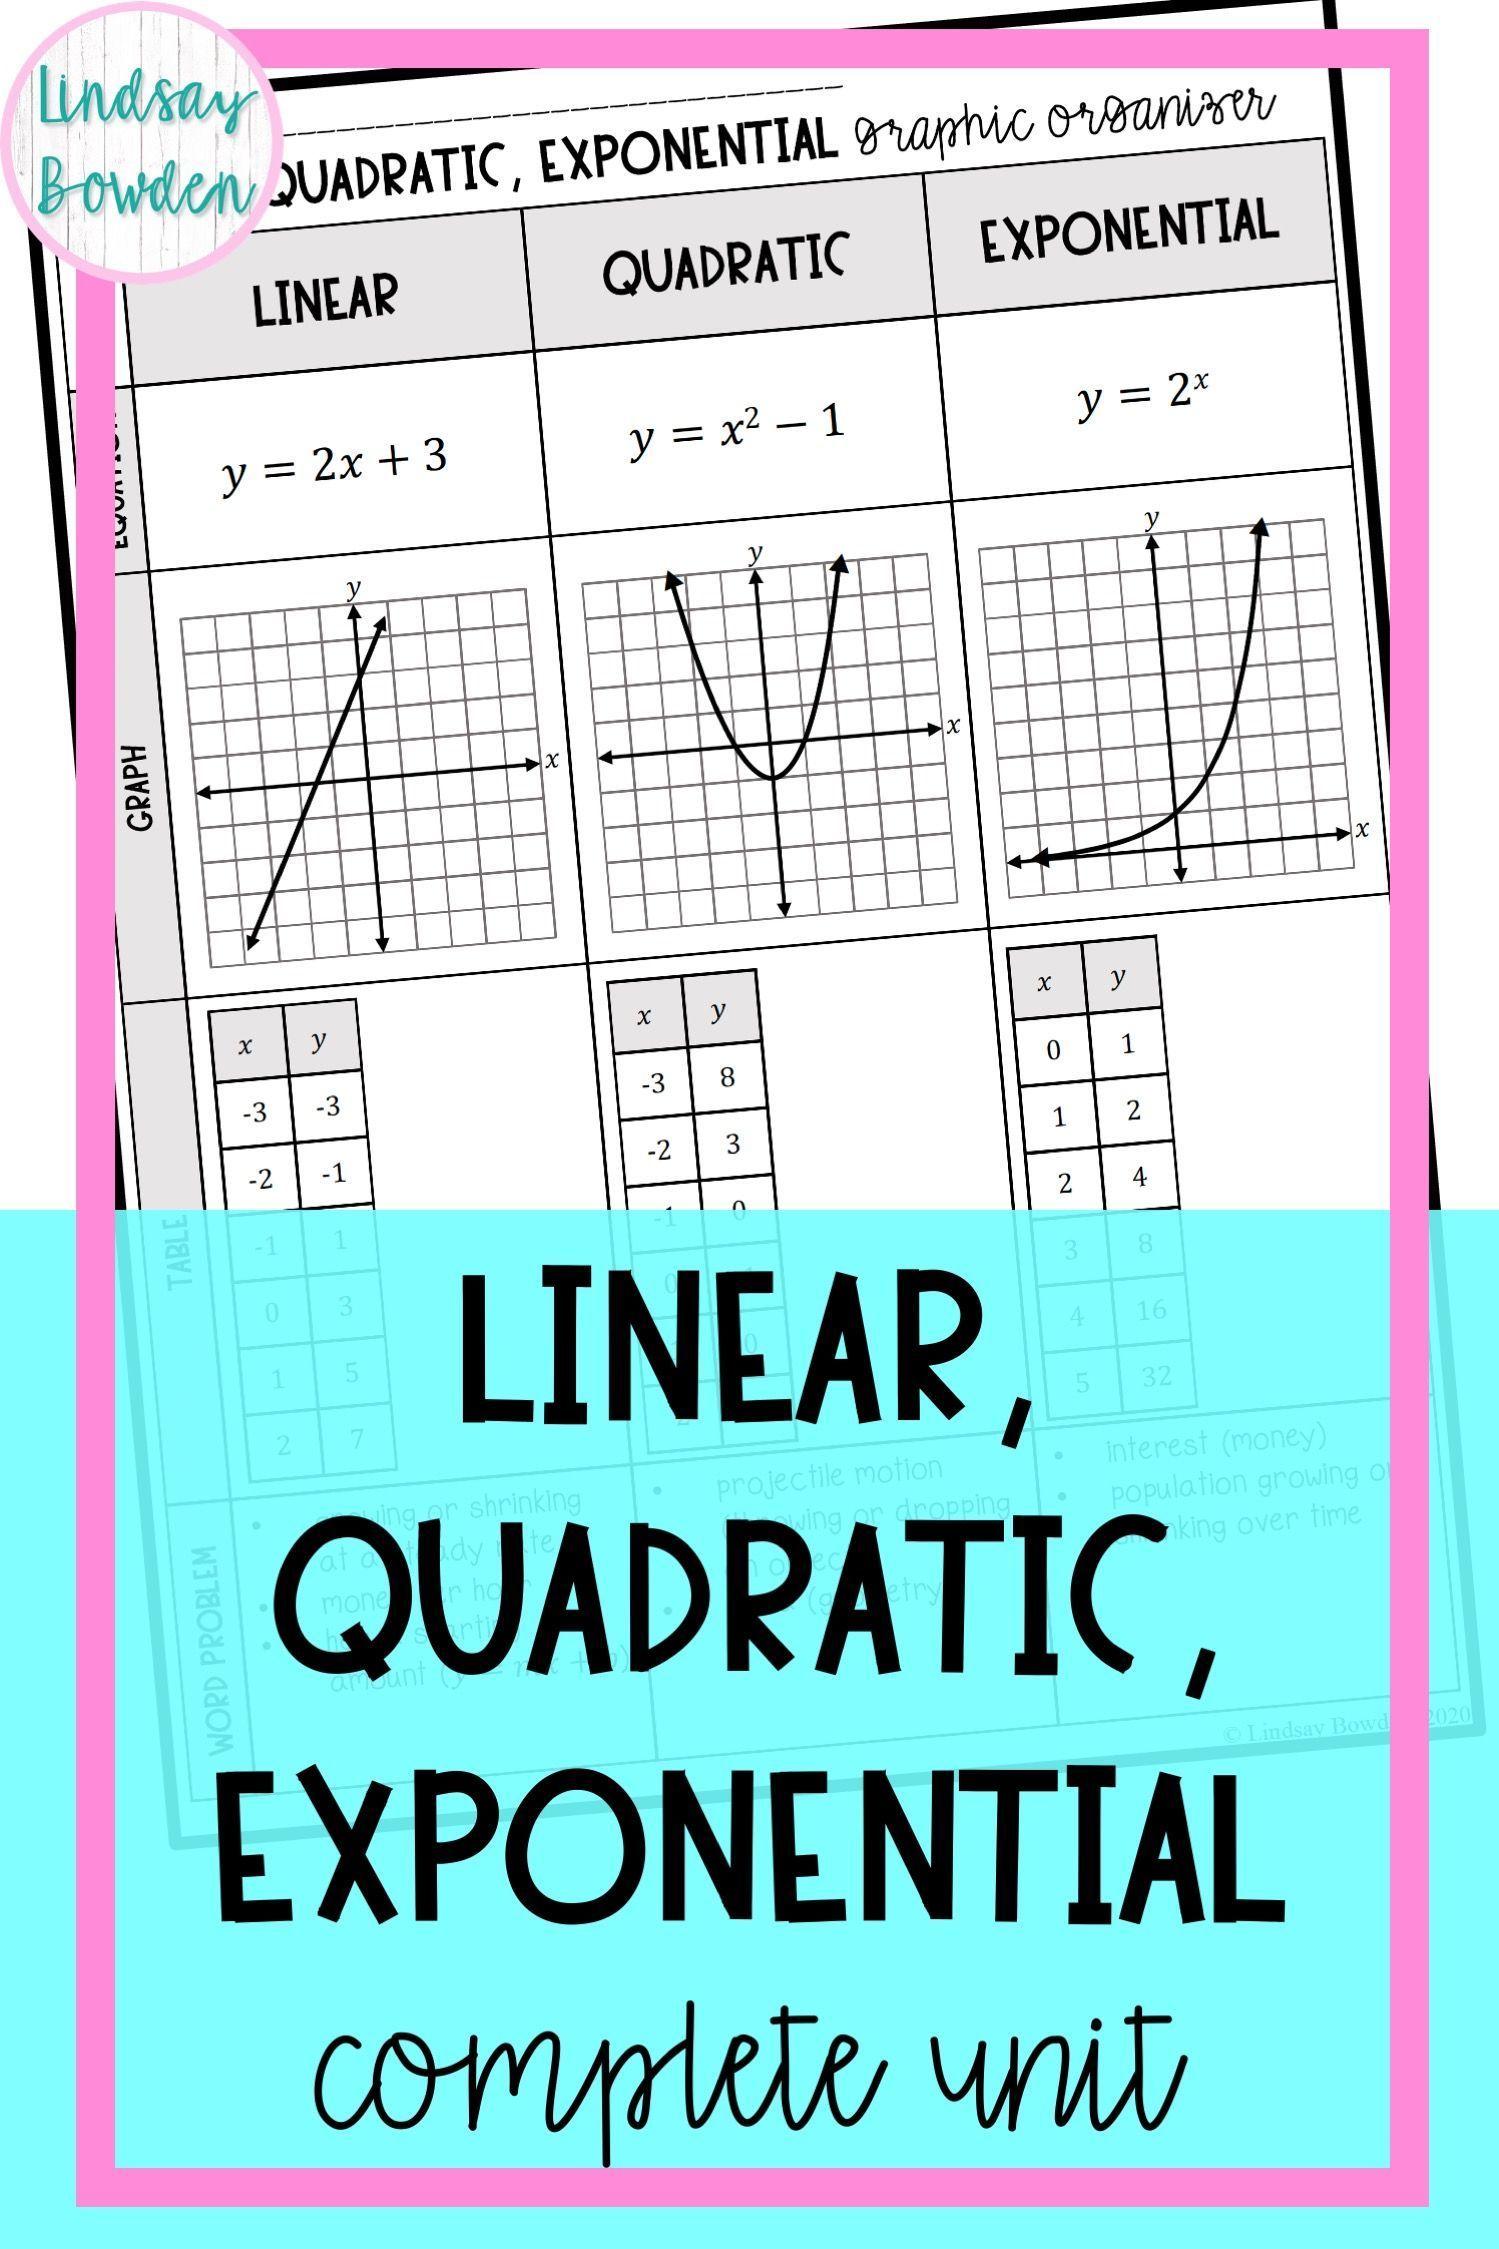 Linear Quadratic Exponential Unit Algebra 1 Unit 9 Quadratics Algebra Activities High School Algebra 1 [ 2249 x 1499 Pixel ]